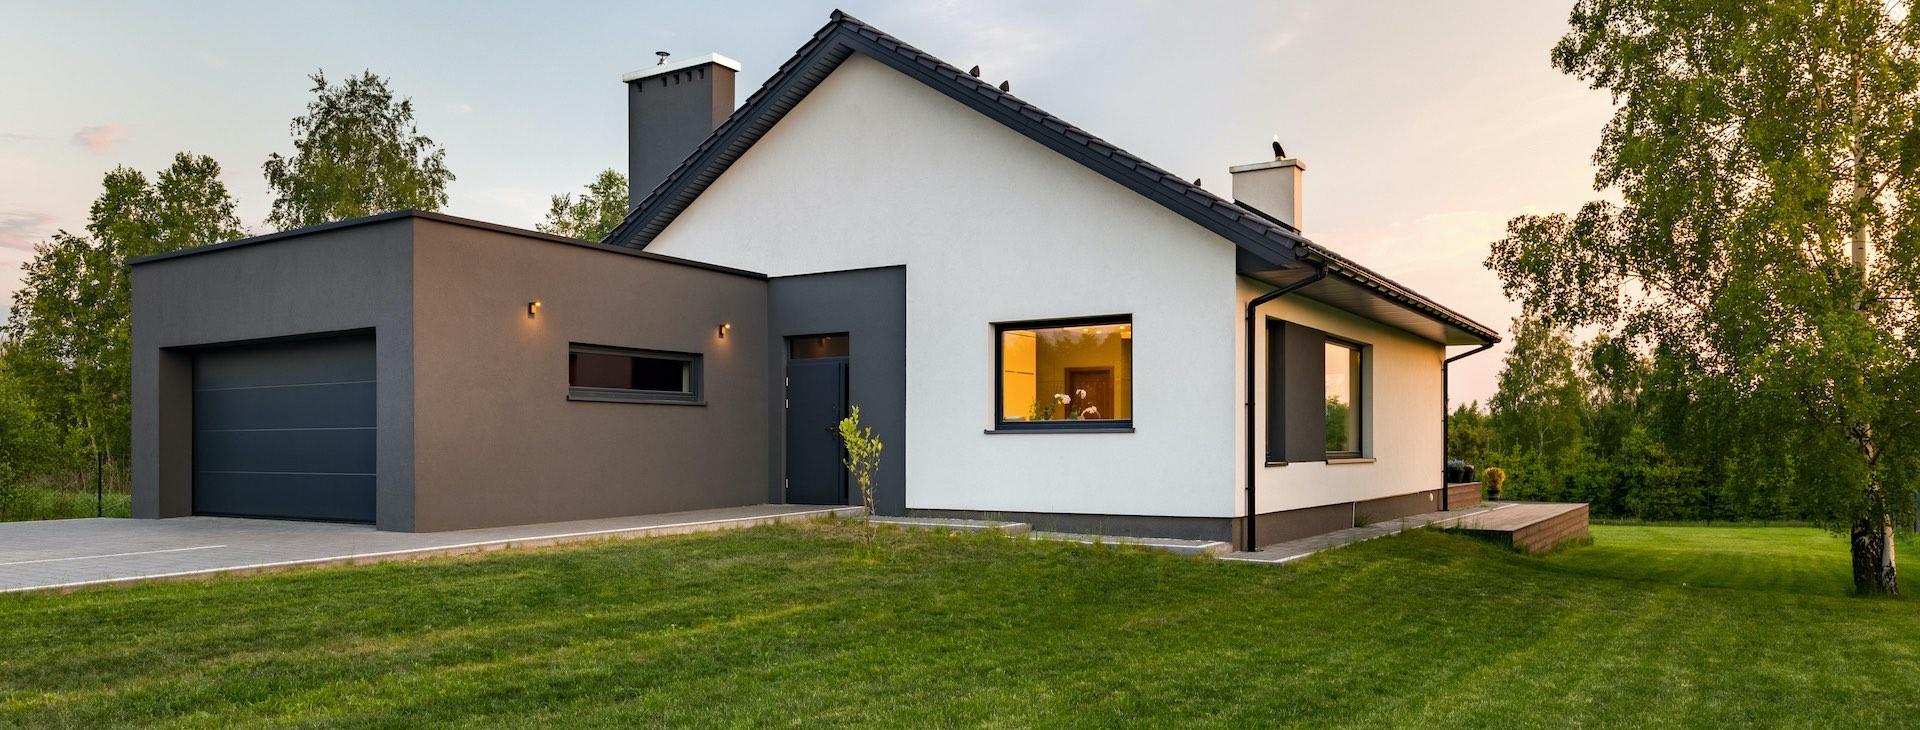 Immobilienmakler Lilienthal Bremen – UC Immobilien – Freistehendes Haus – UC Immobilien